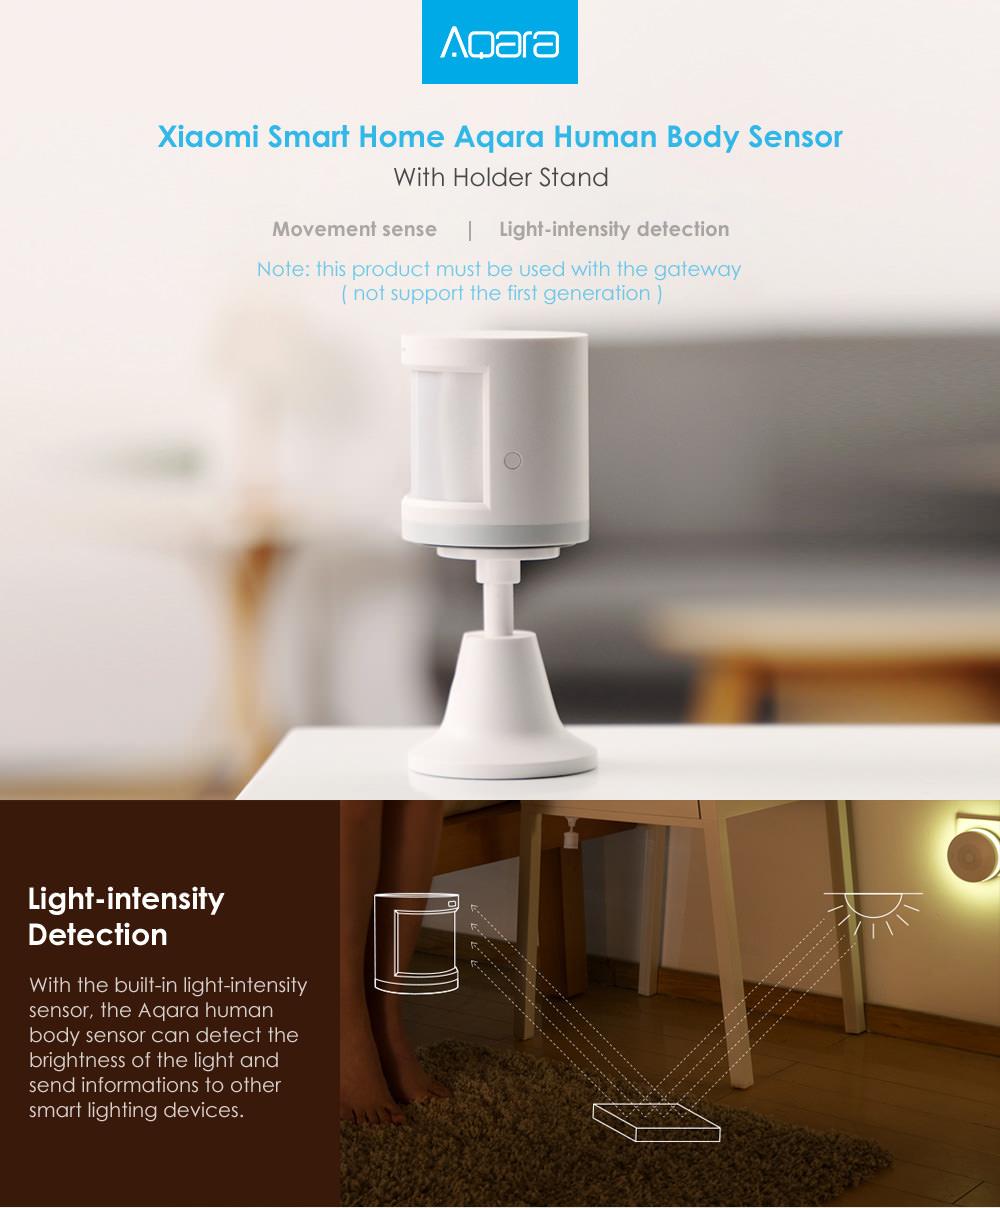 xiaomi aqara human body sensor